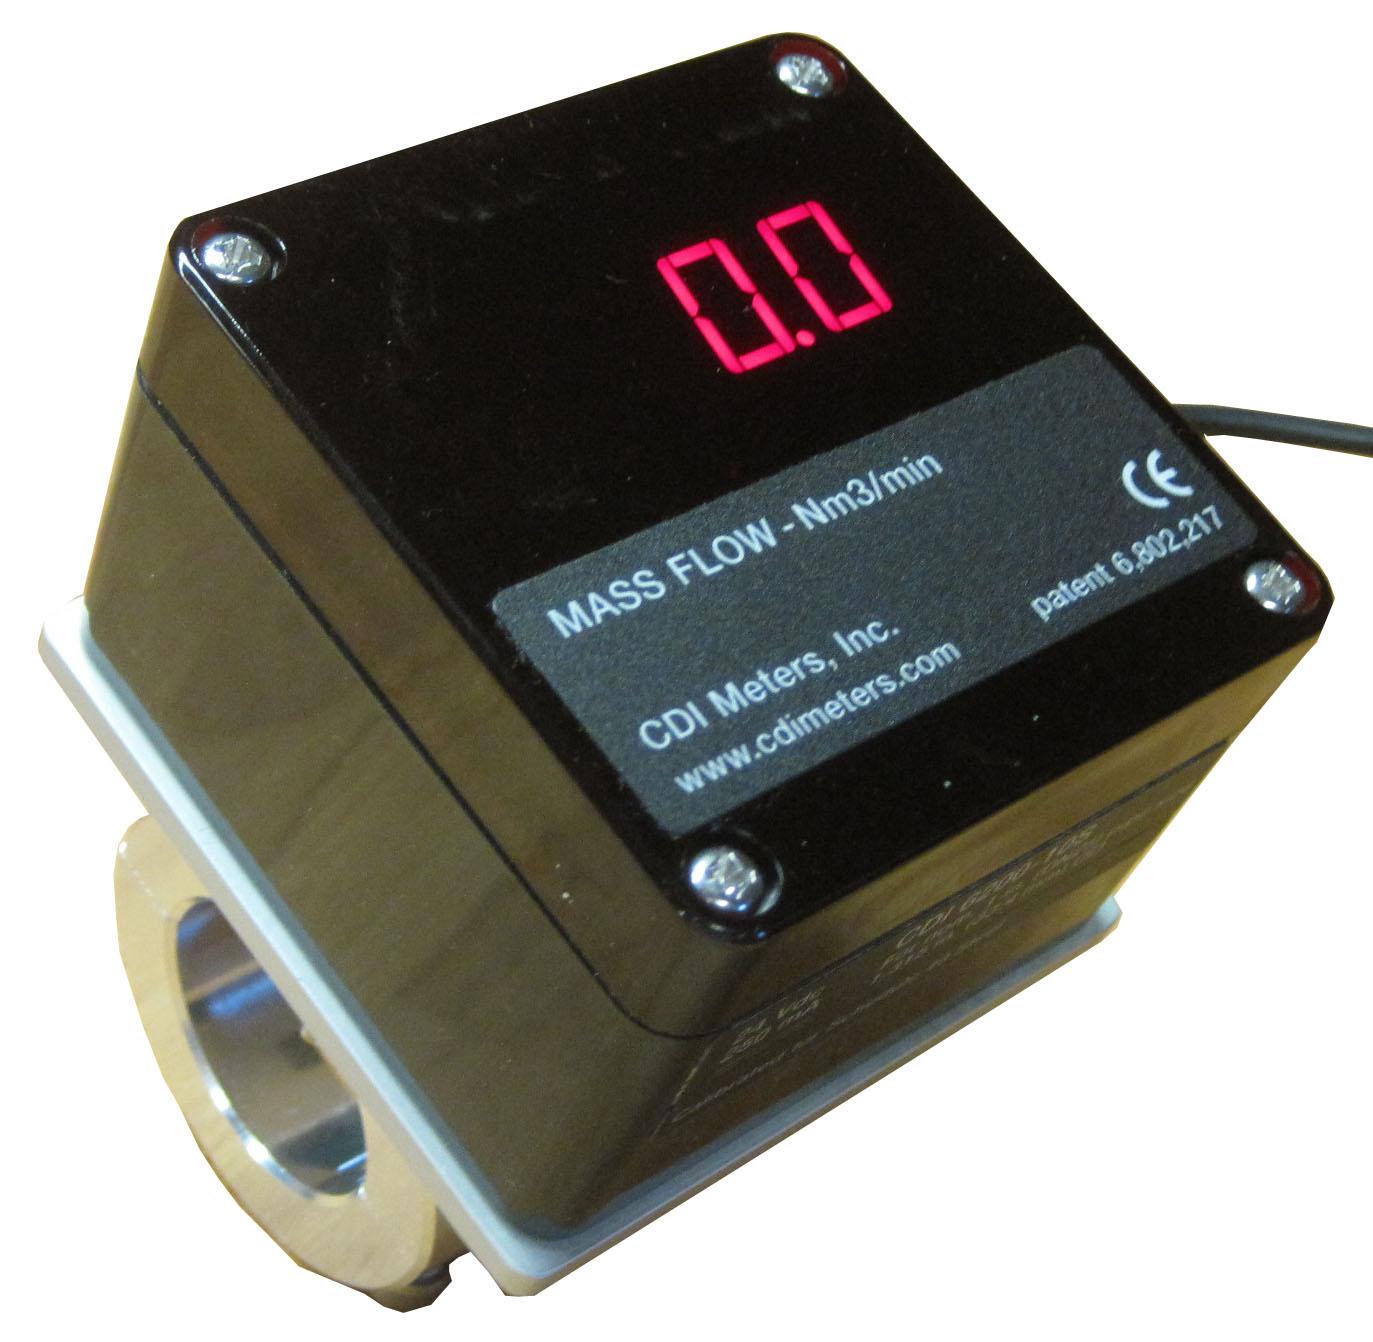 CDI 6200 Compressed Air Flow Meter rugged Universal